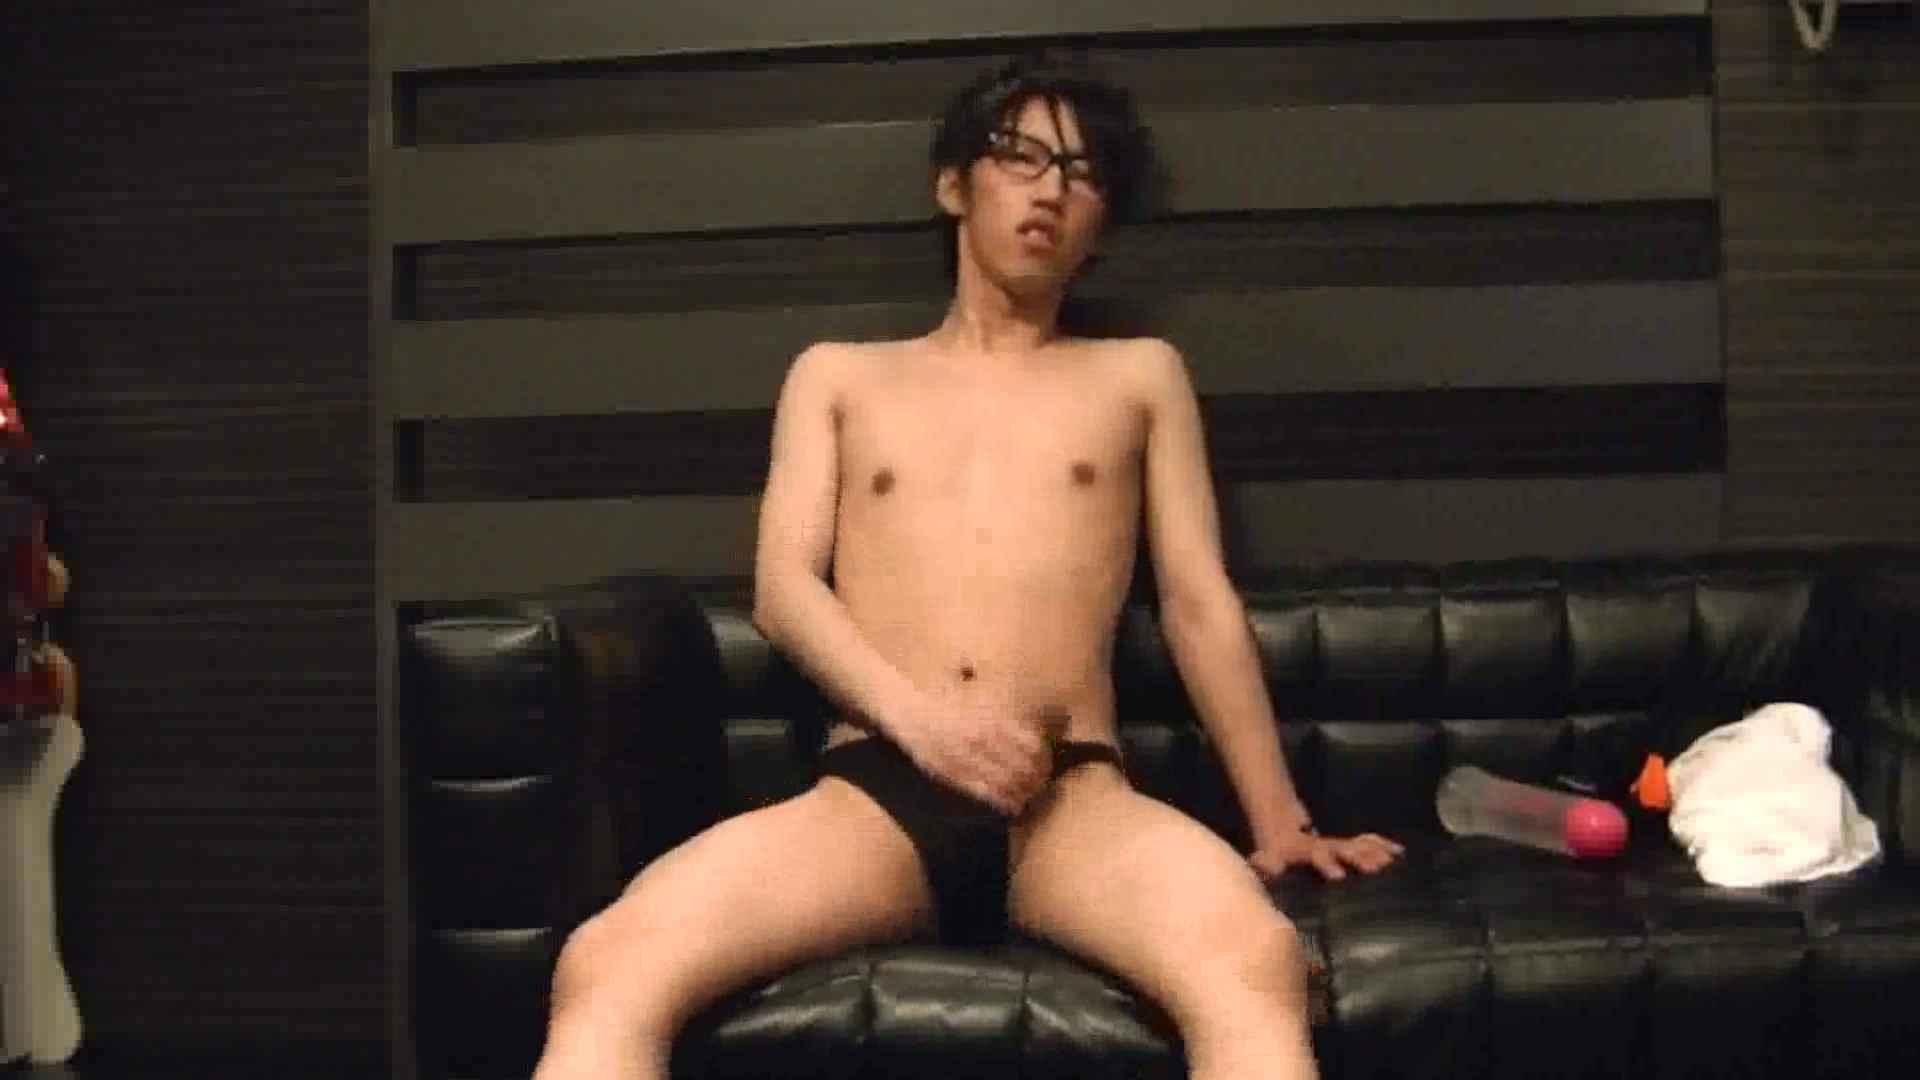 ONA見せカーニバル!! Vol3 男 ゲイ無料無修正画像 89枚 45